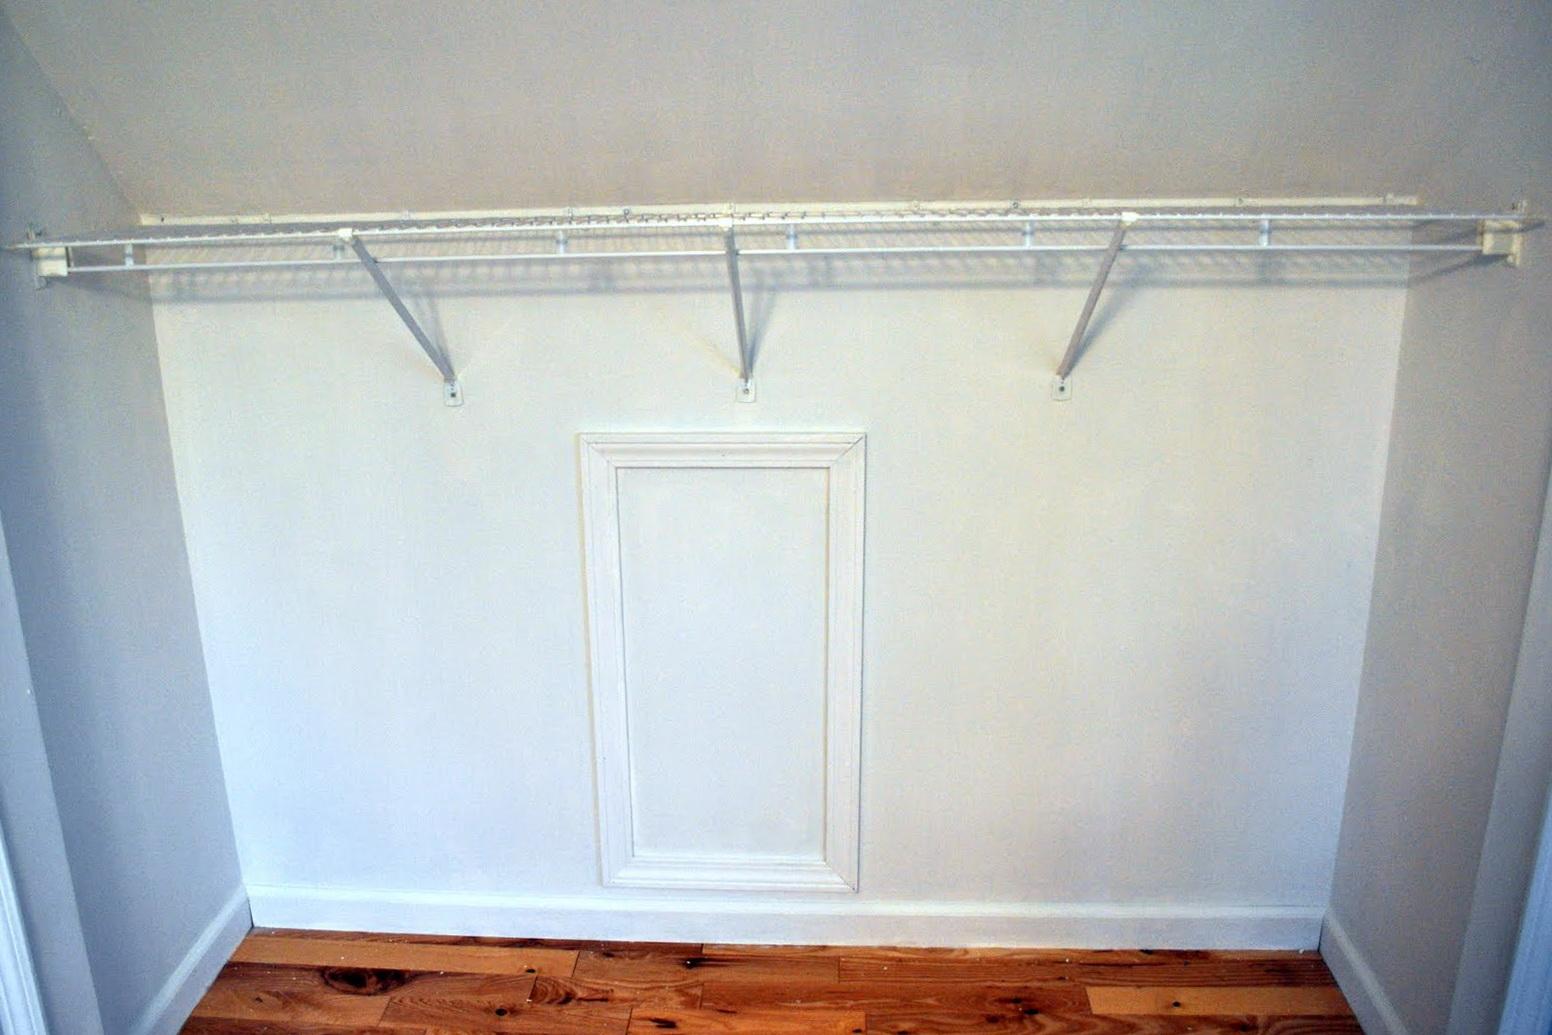 diy closet rod. Diy Closet Rod Dividers